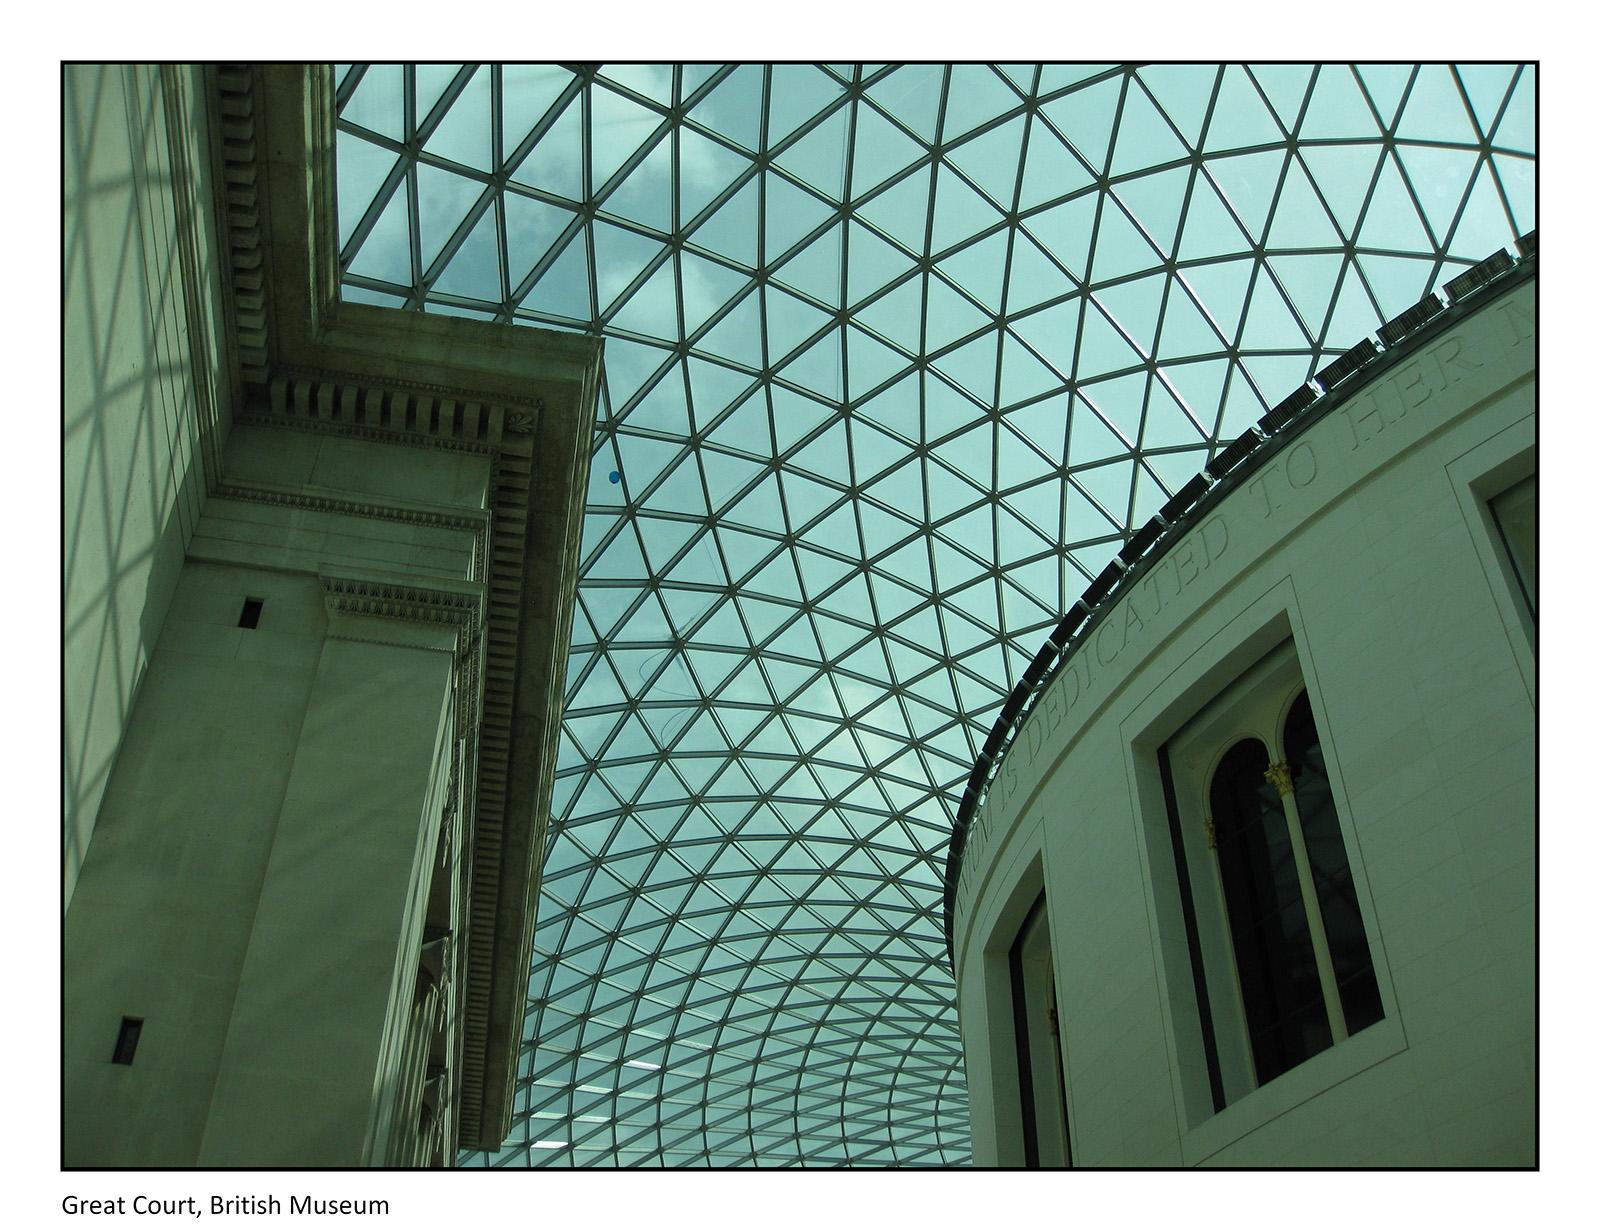 British Museum by Angela Deane